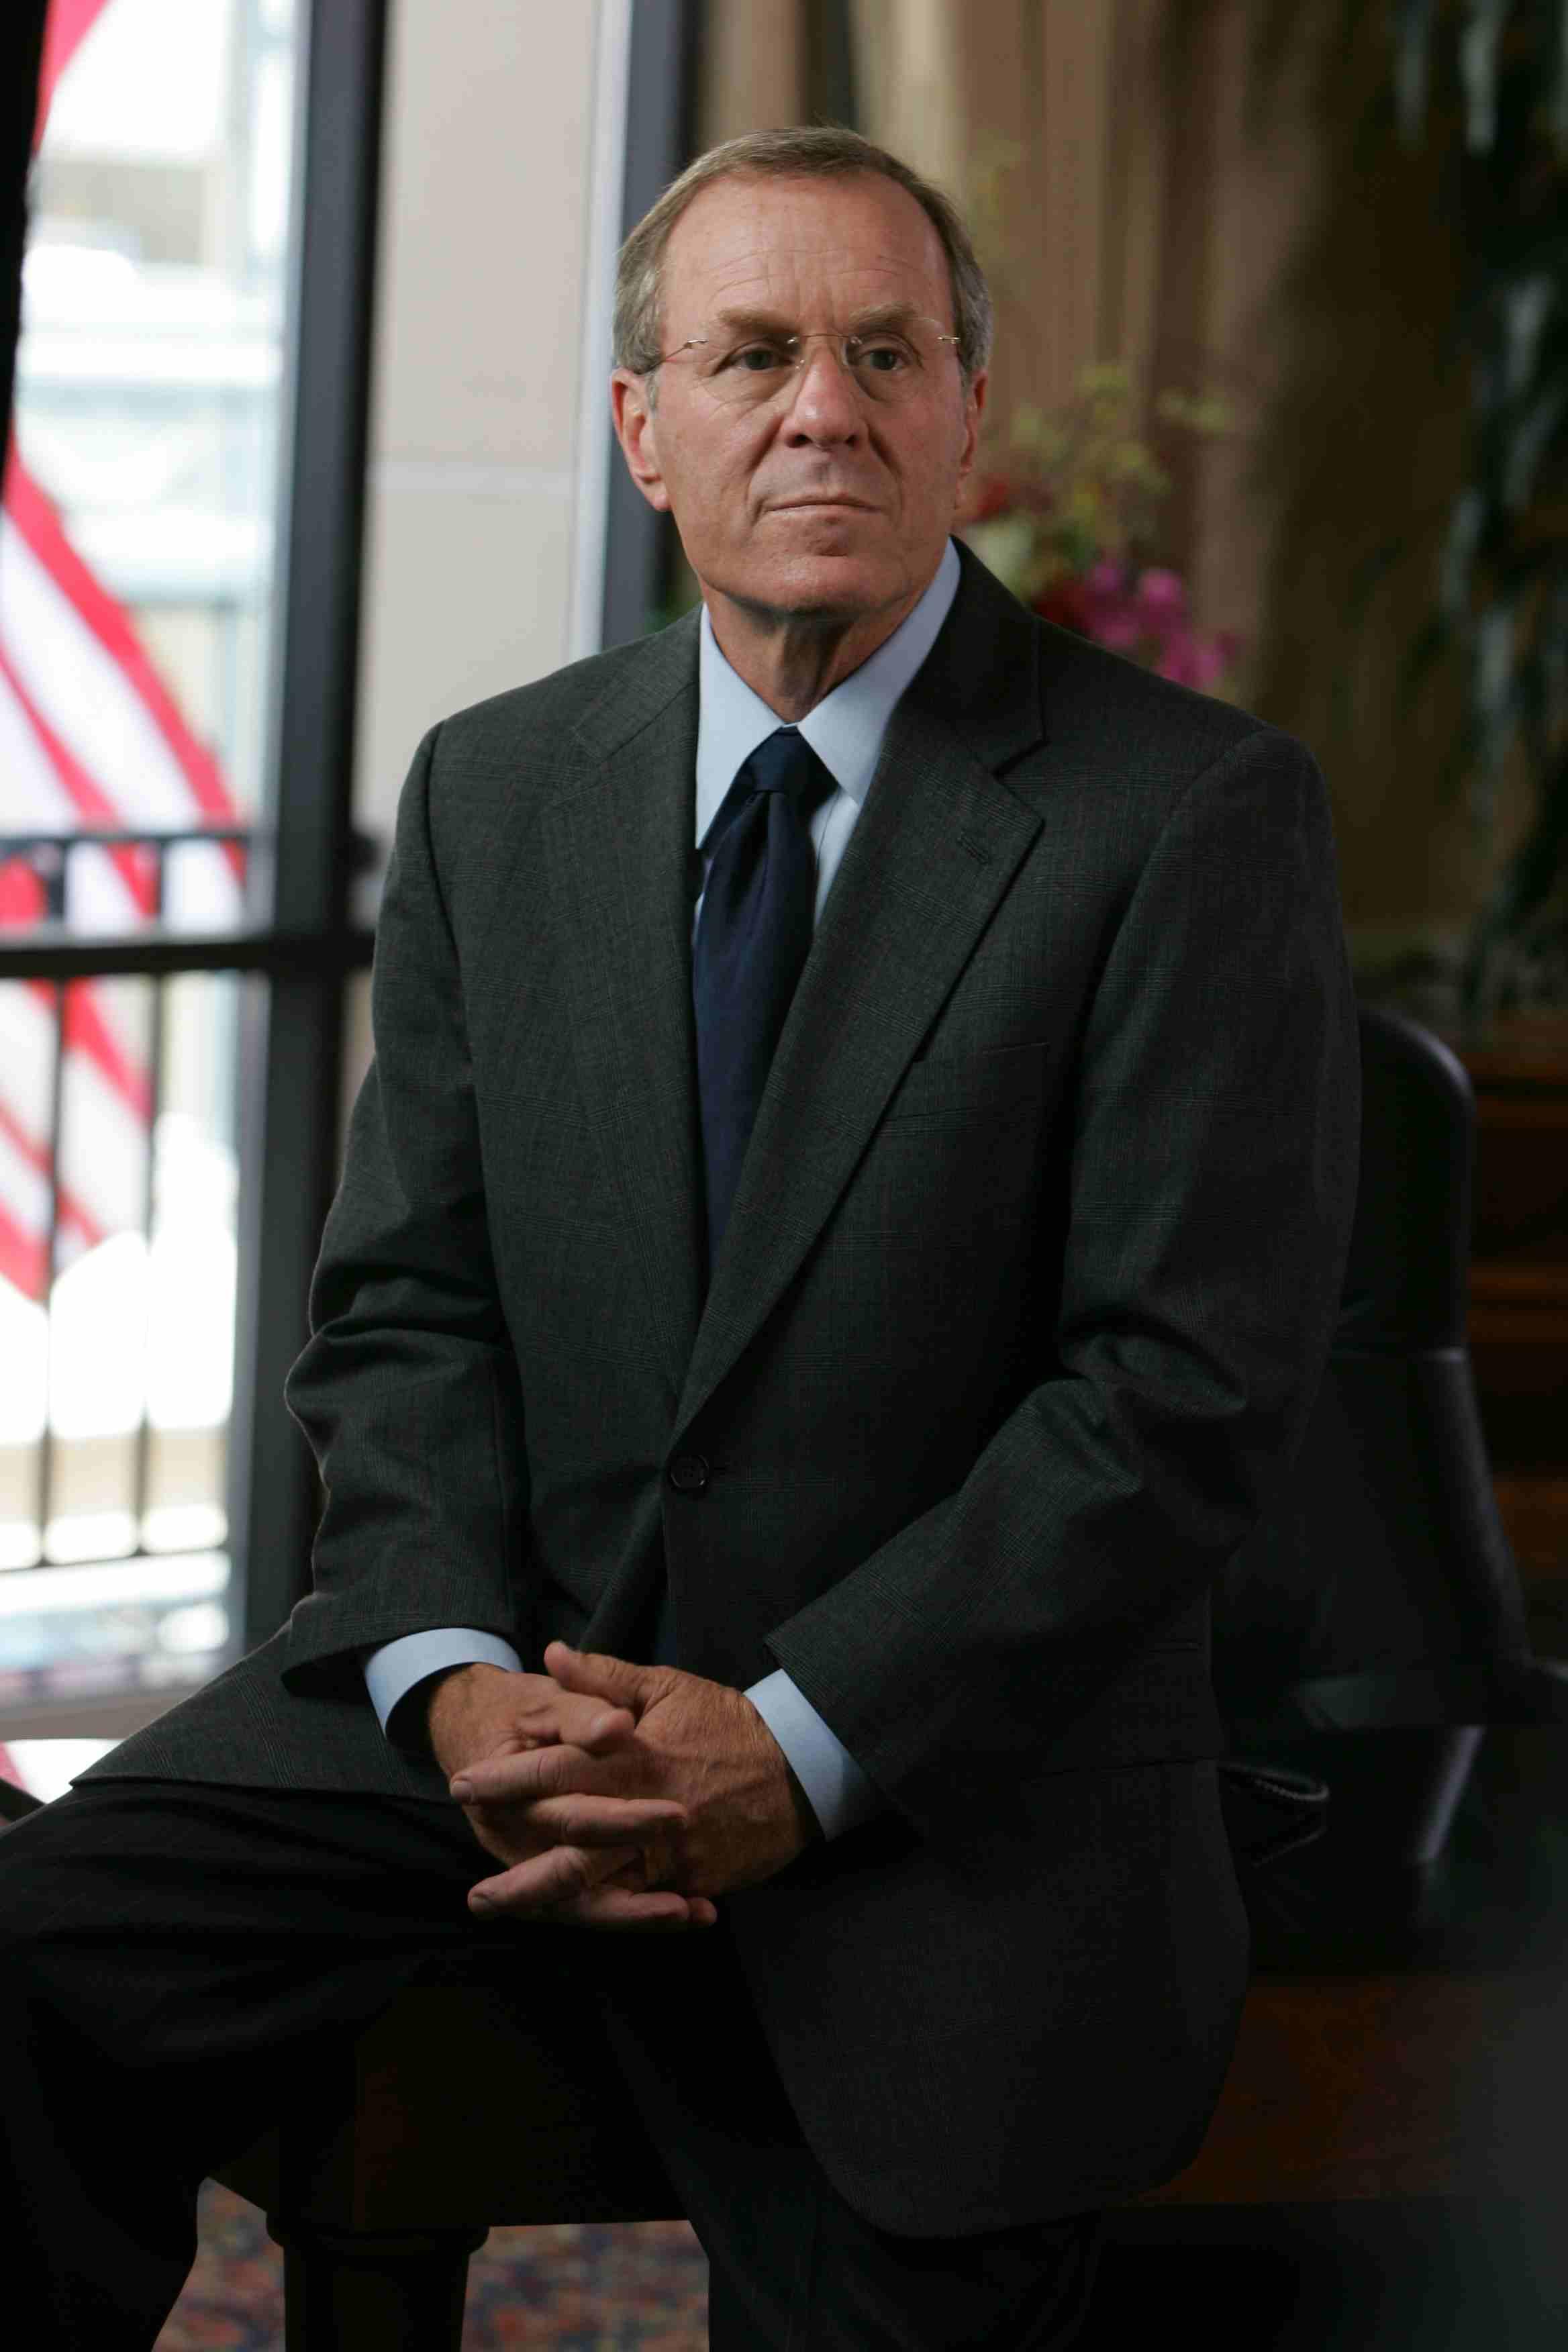 Ted Wins DA's Endorsement